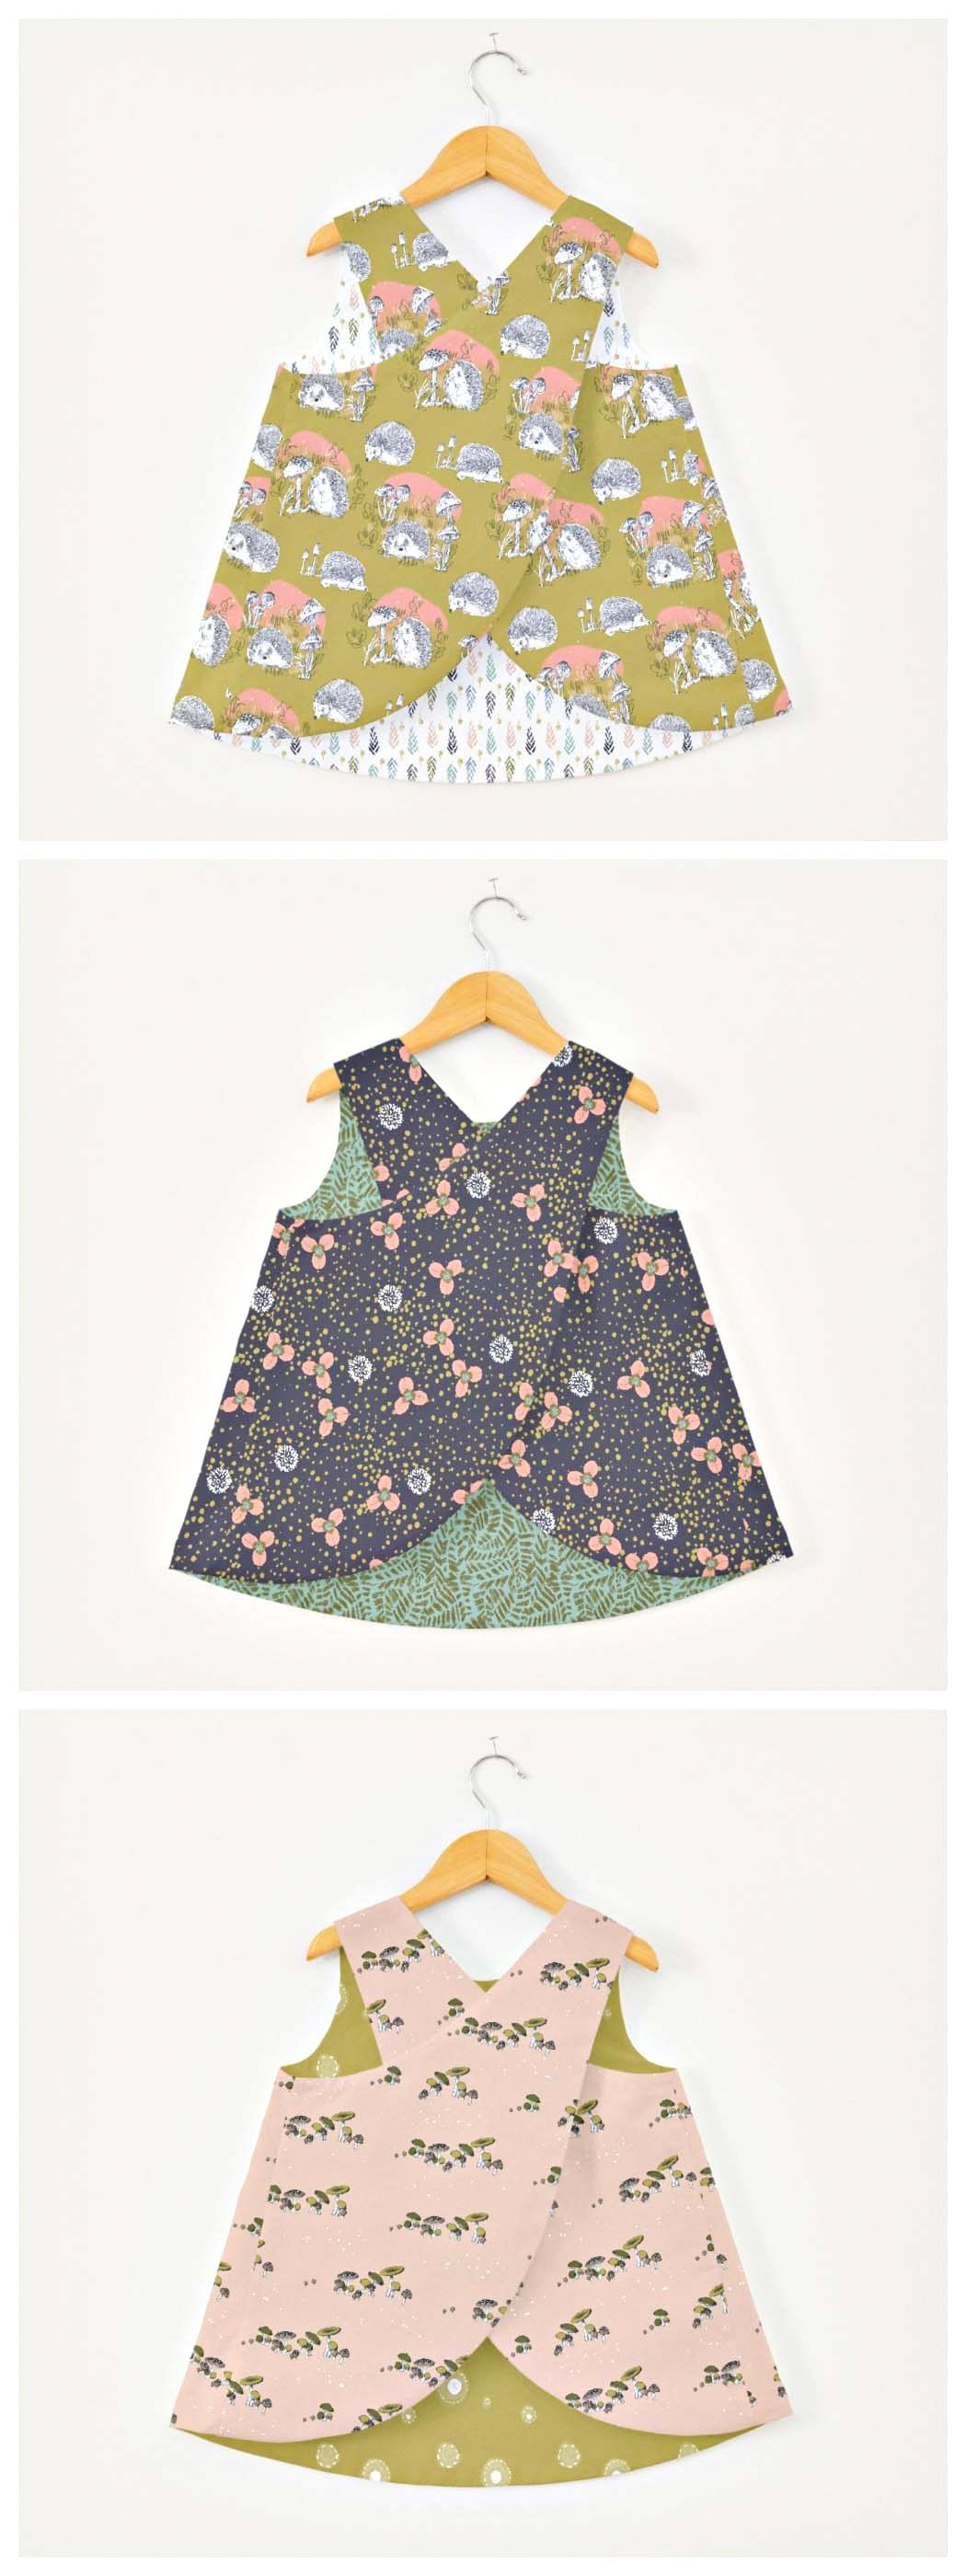 New in Original pack JULIETTE Girls Pattern by Violette Field Threads Sz 2T-10